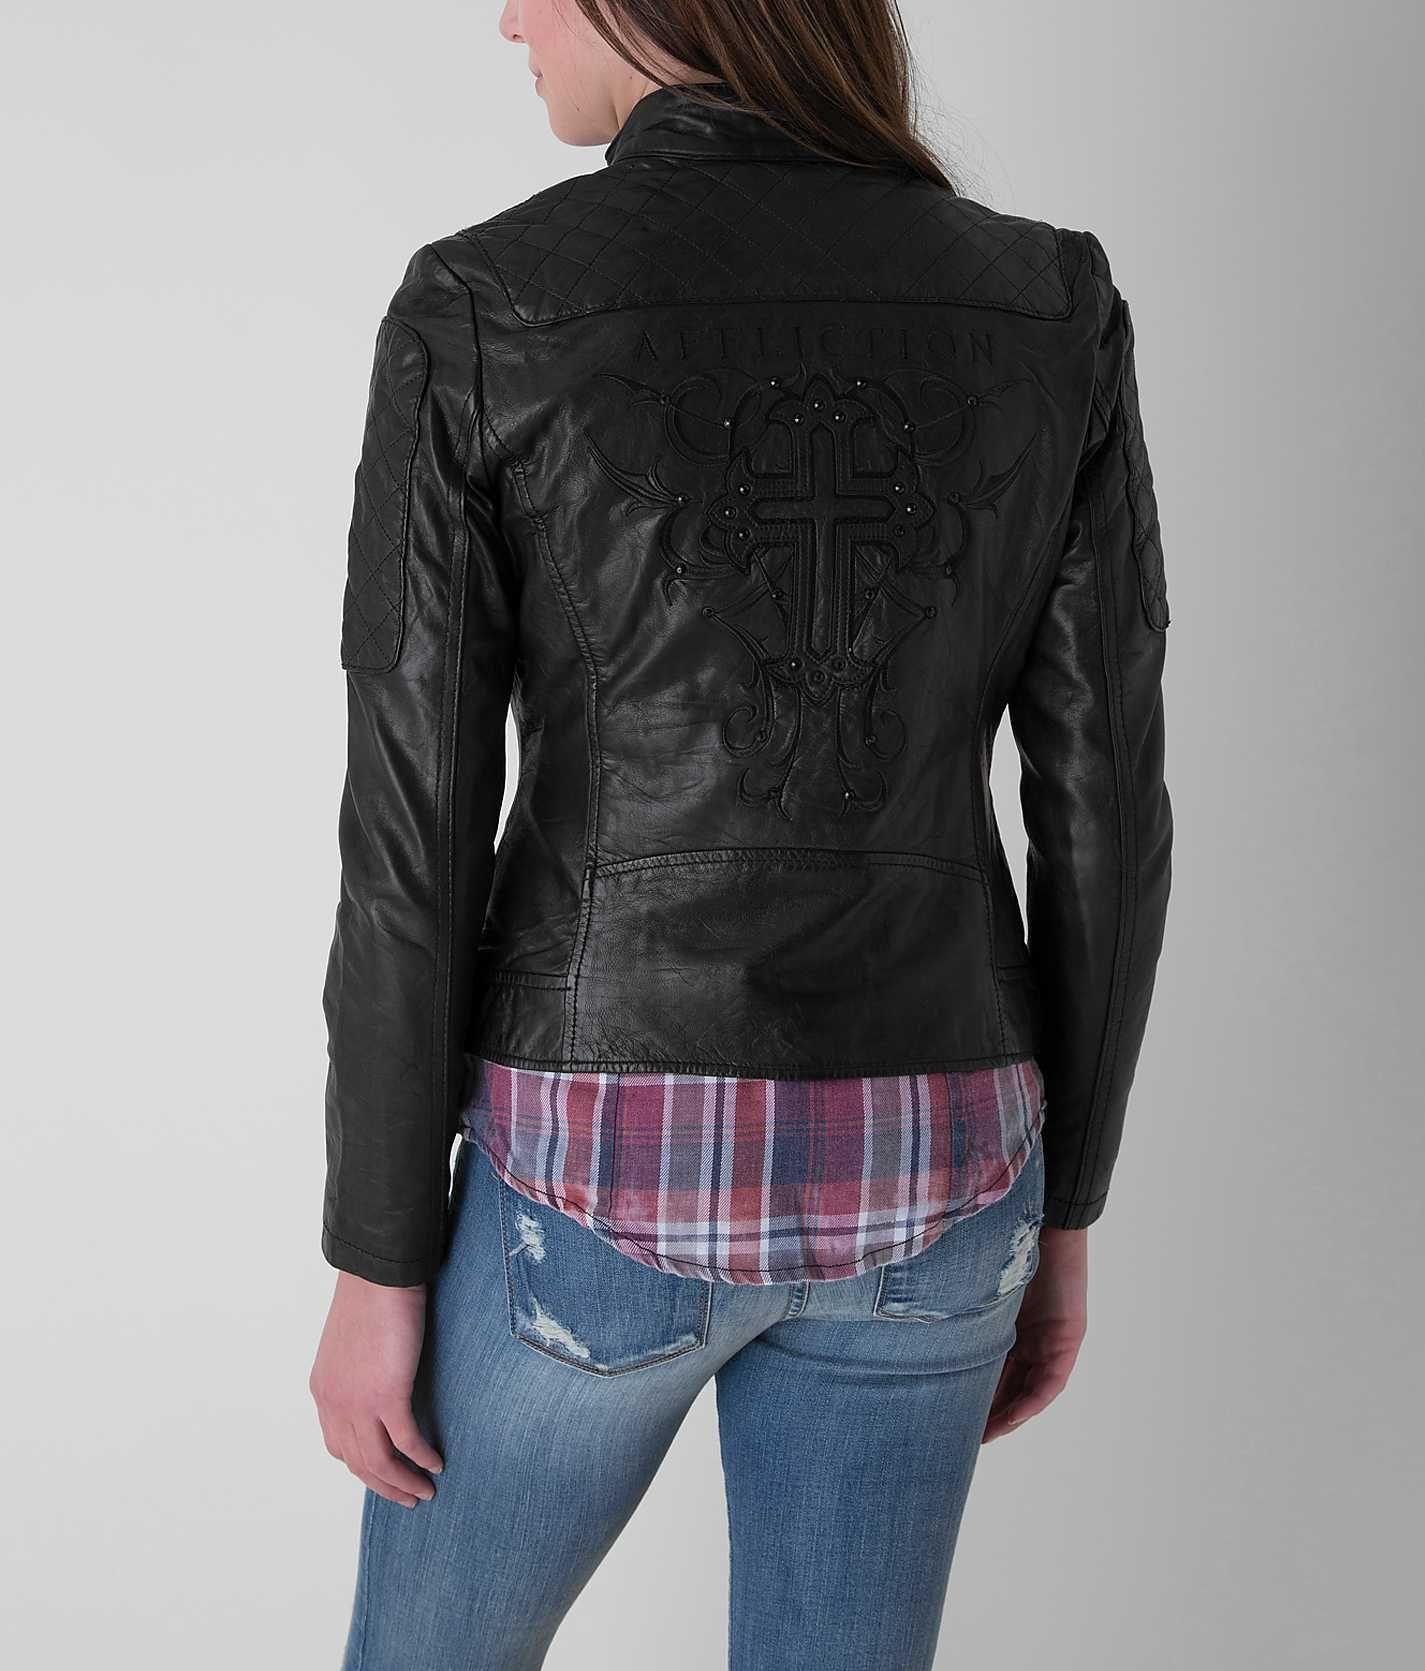 Affliction Black Premium Alexis Jacket Women's Coats